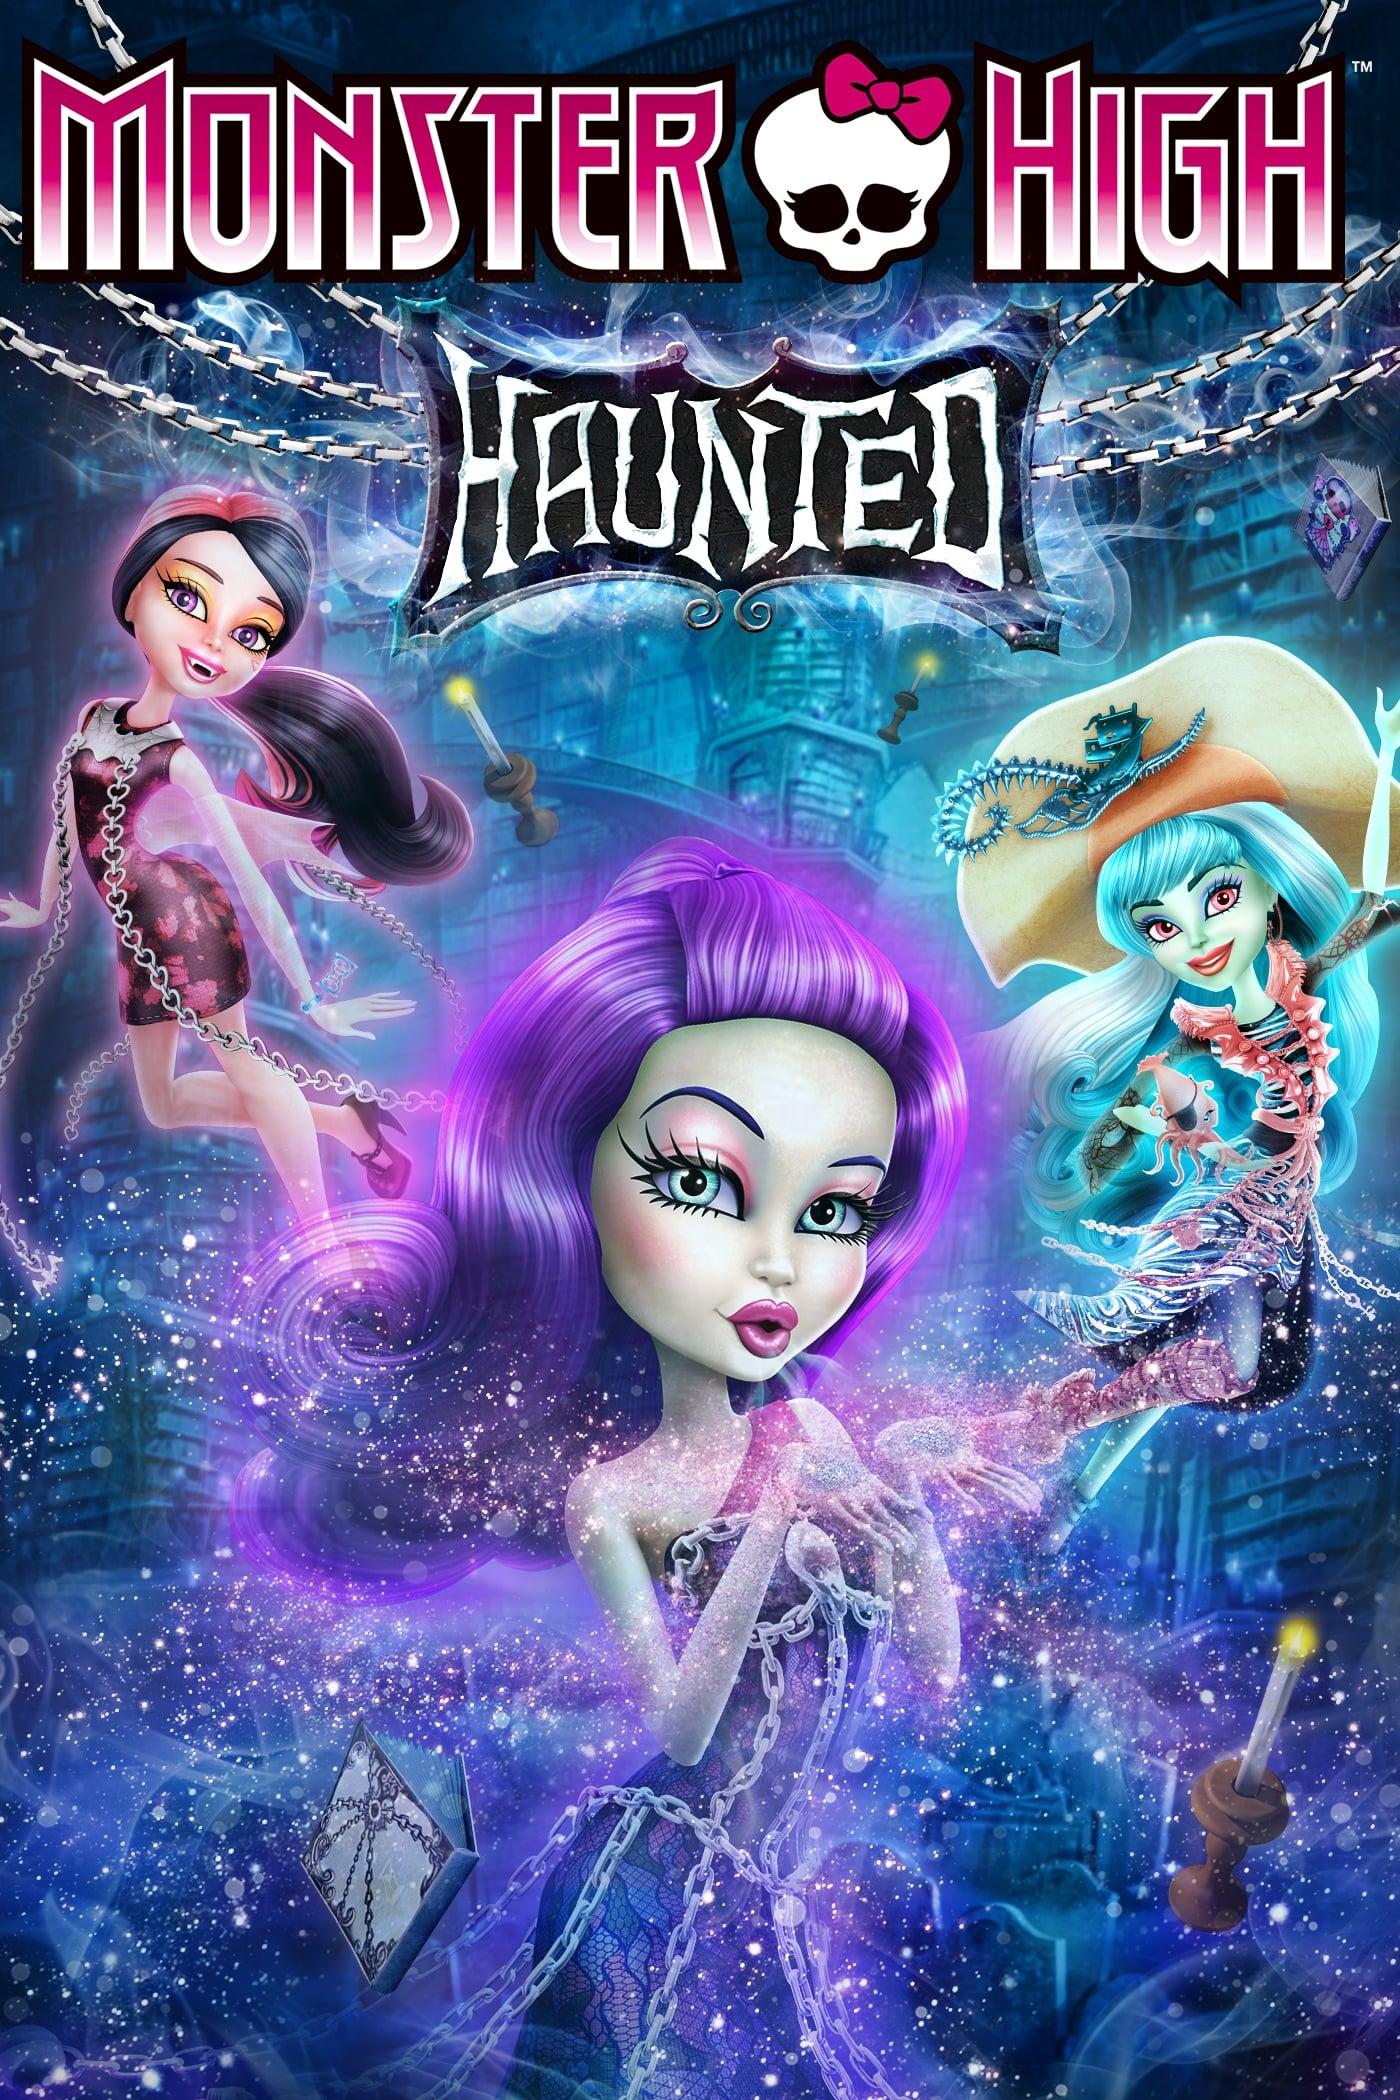 Monster High: Haunted (2015) • movies.film-cine.com